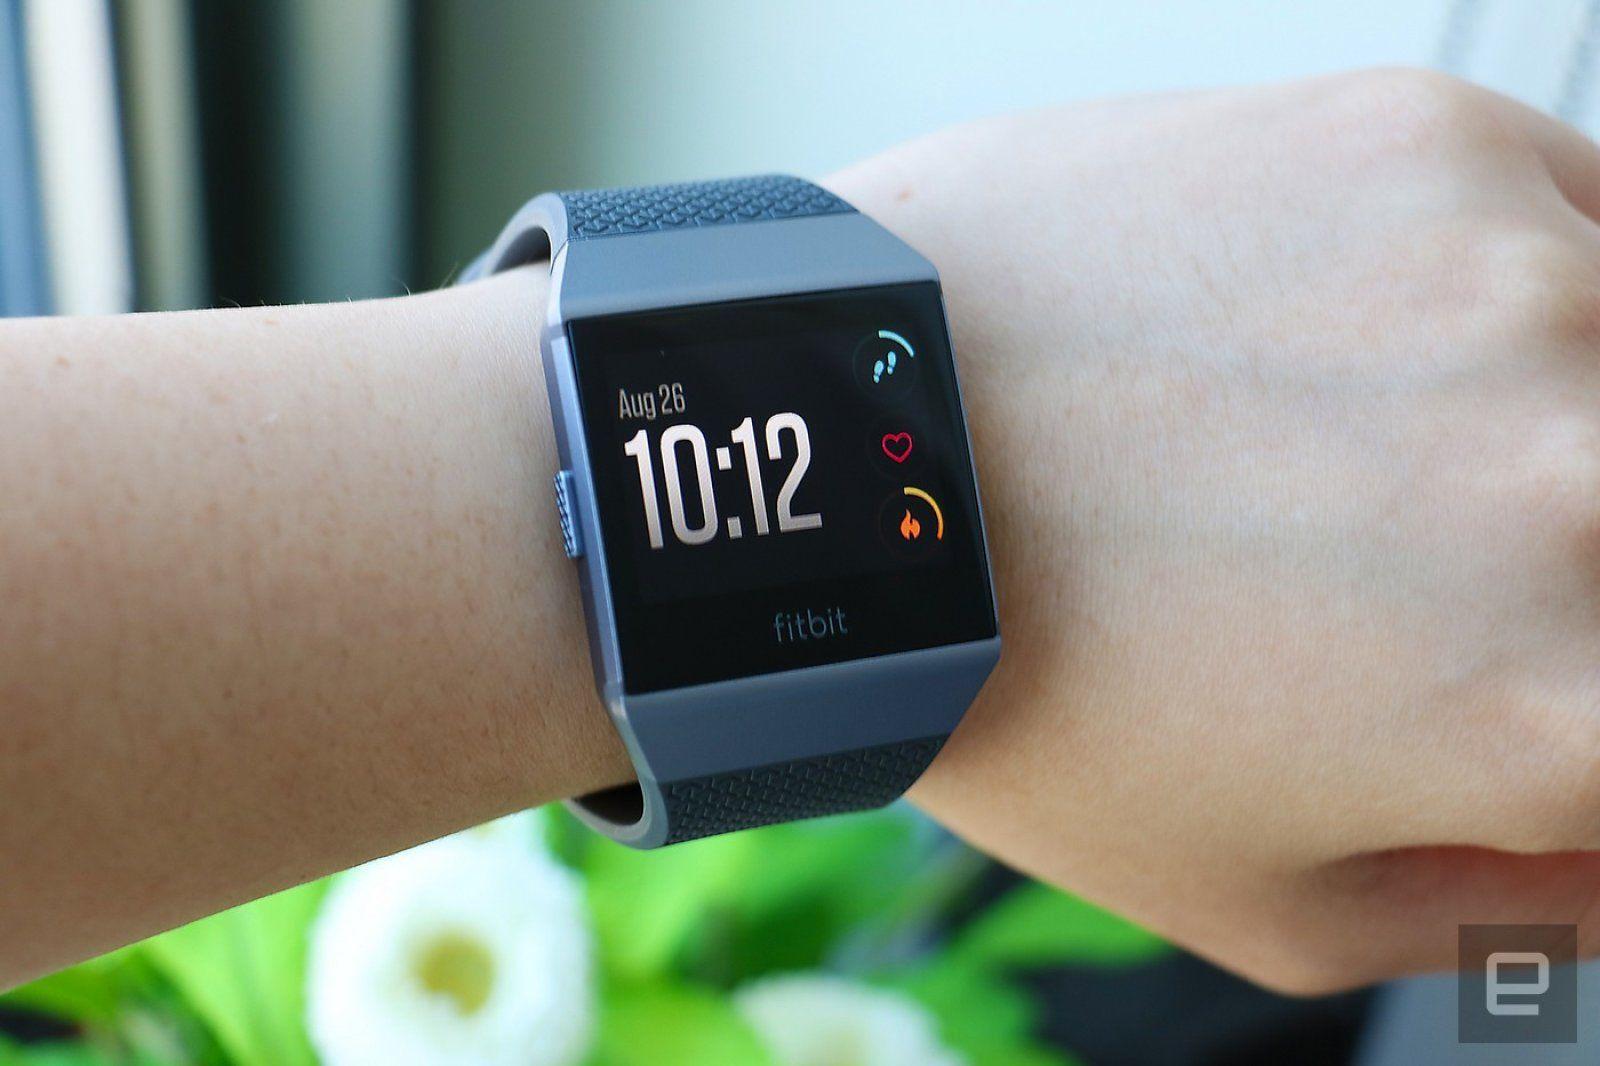 ebe123a081cd9357dc38ee94f7666c6b Smartwatch Cgm